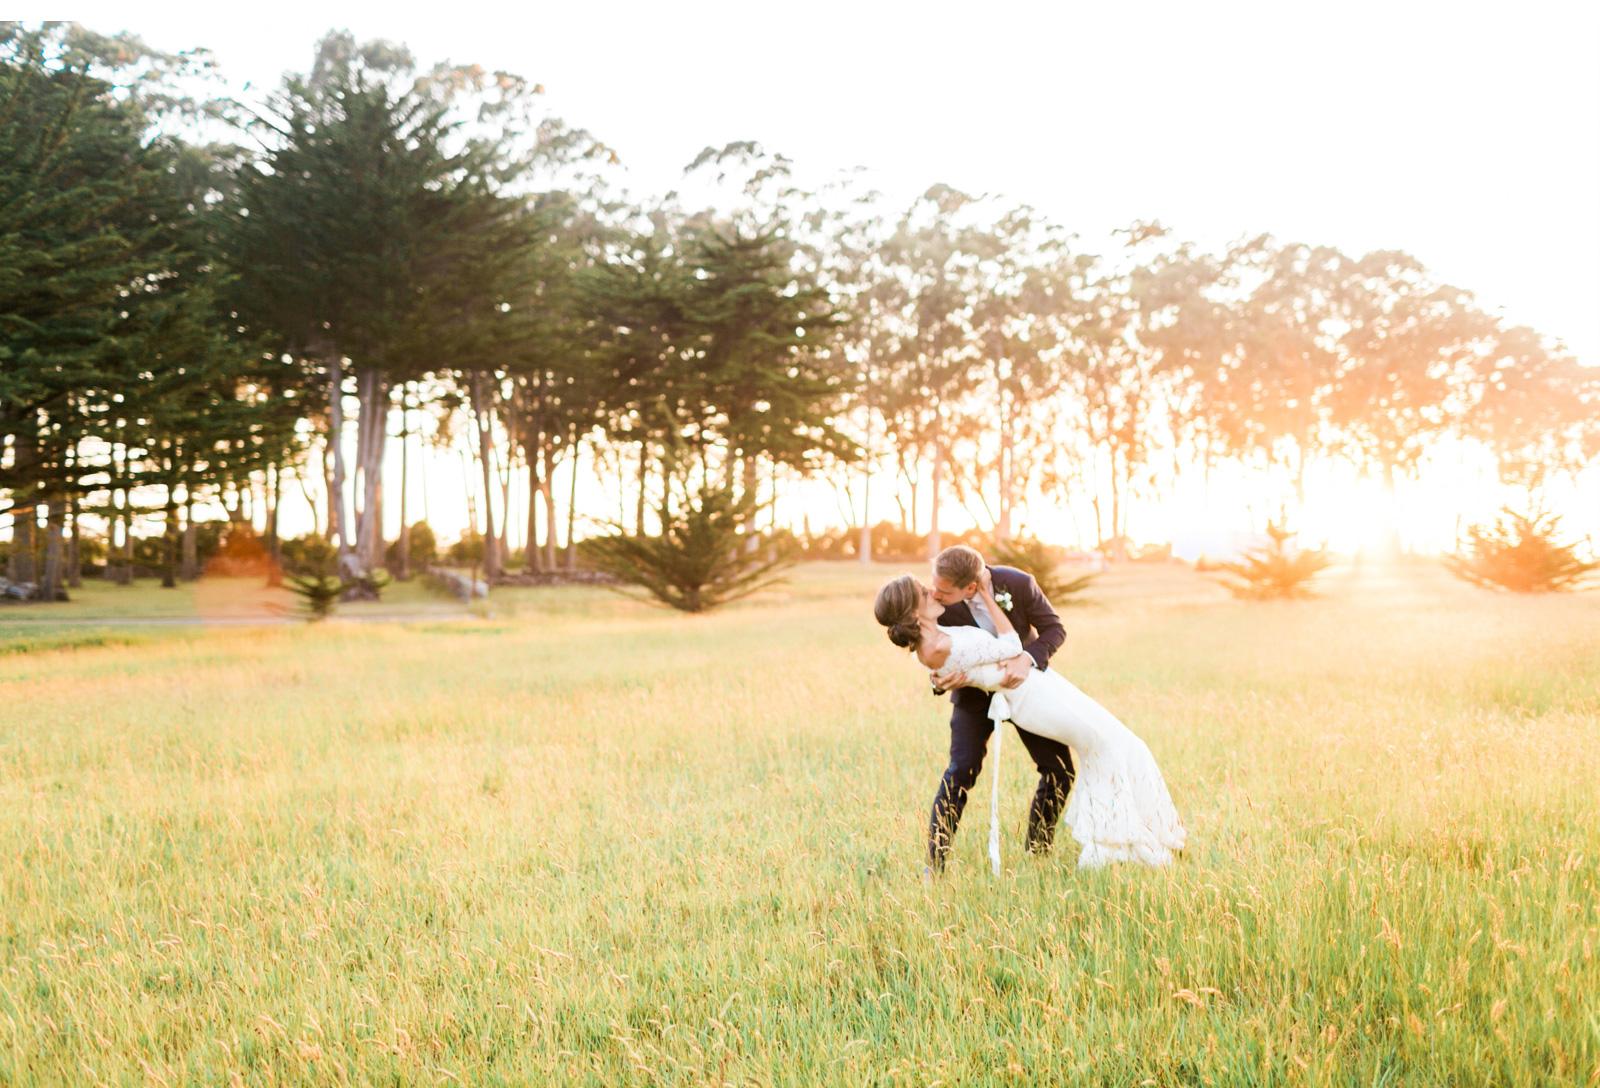 Natalie-Schutt-Photography-Adventure-Wedding-Mendocino_07.jpg